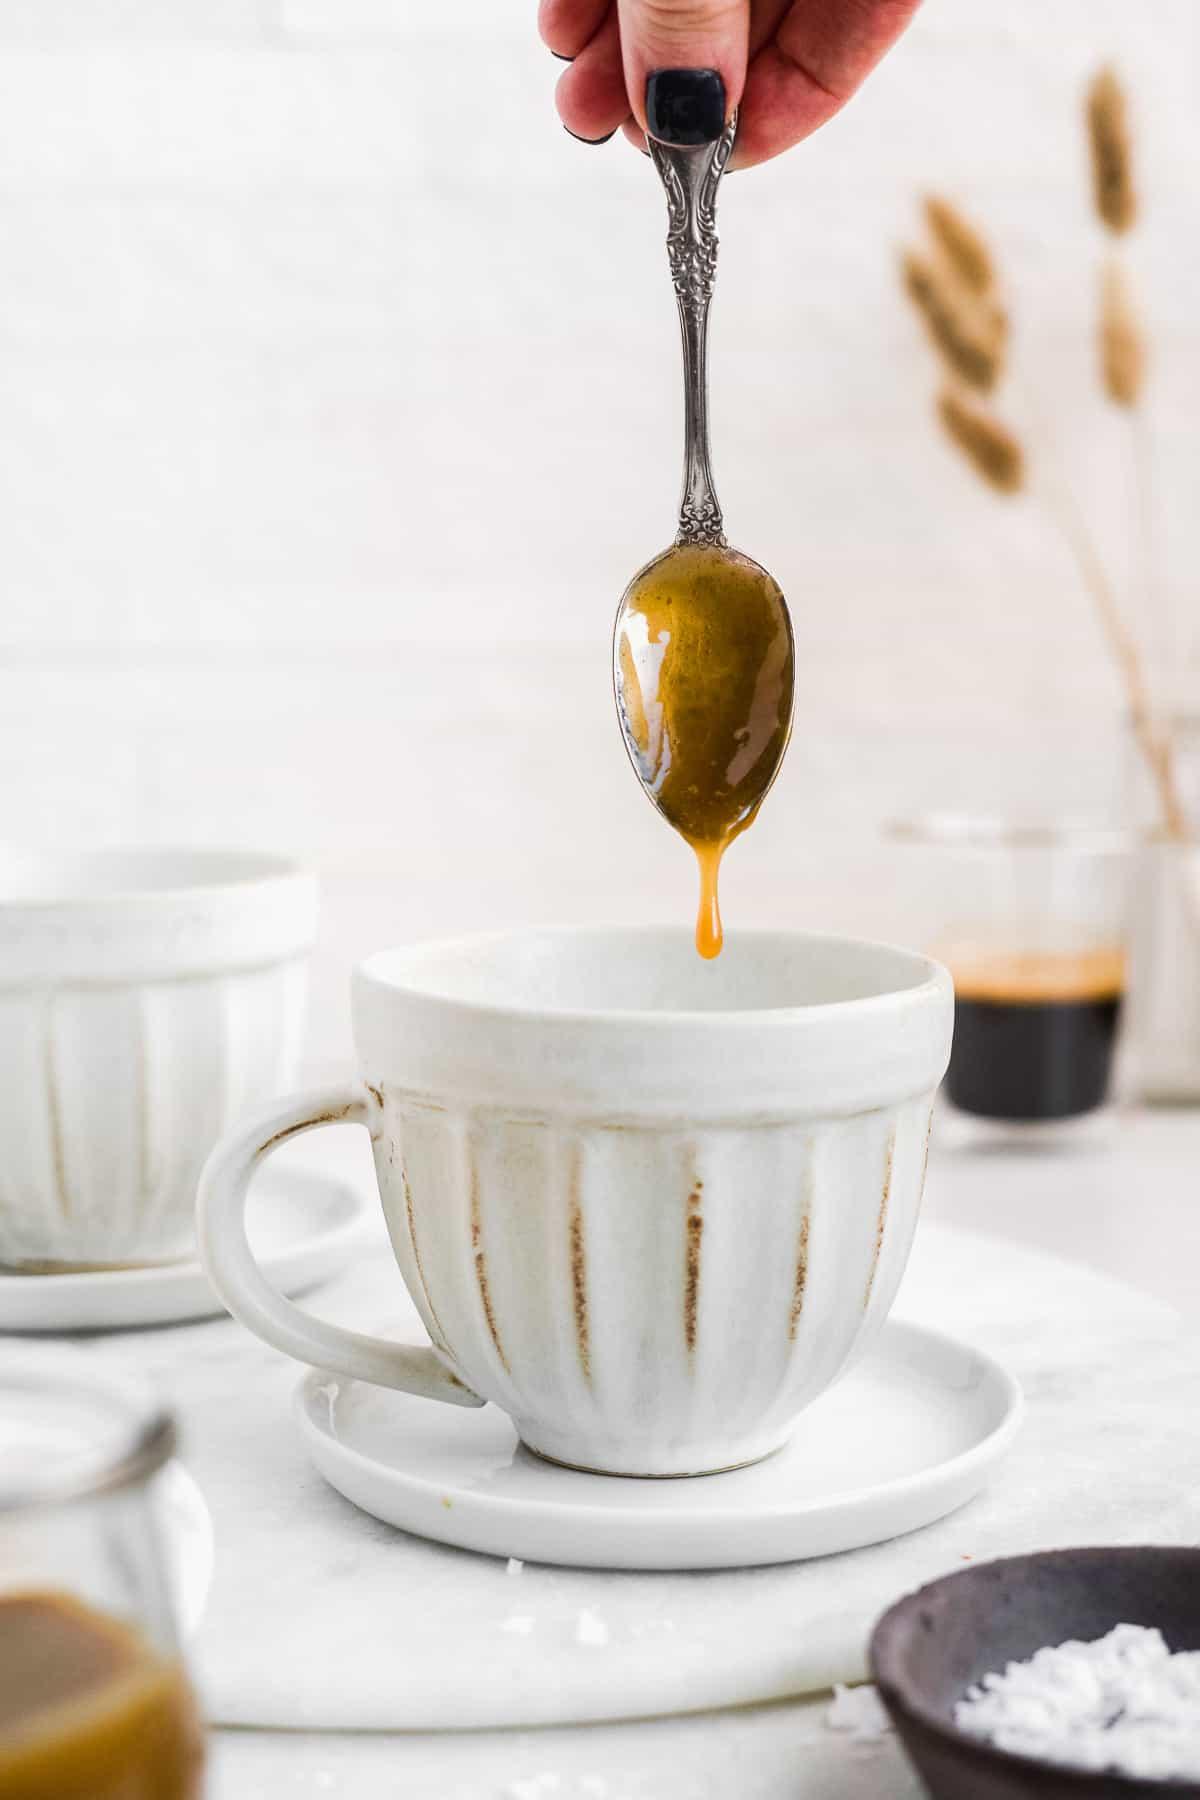 Spoon upside down dripping caramel inside a white coffee mug.